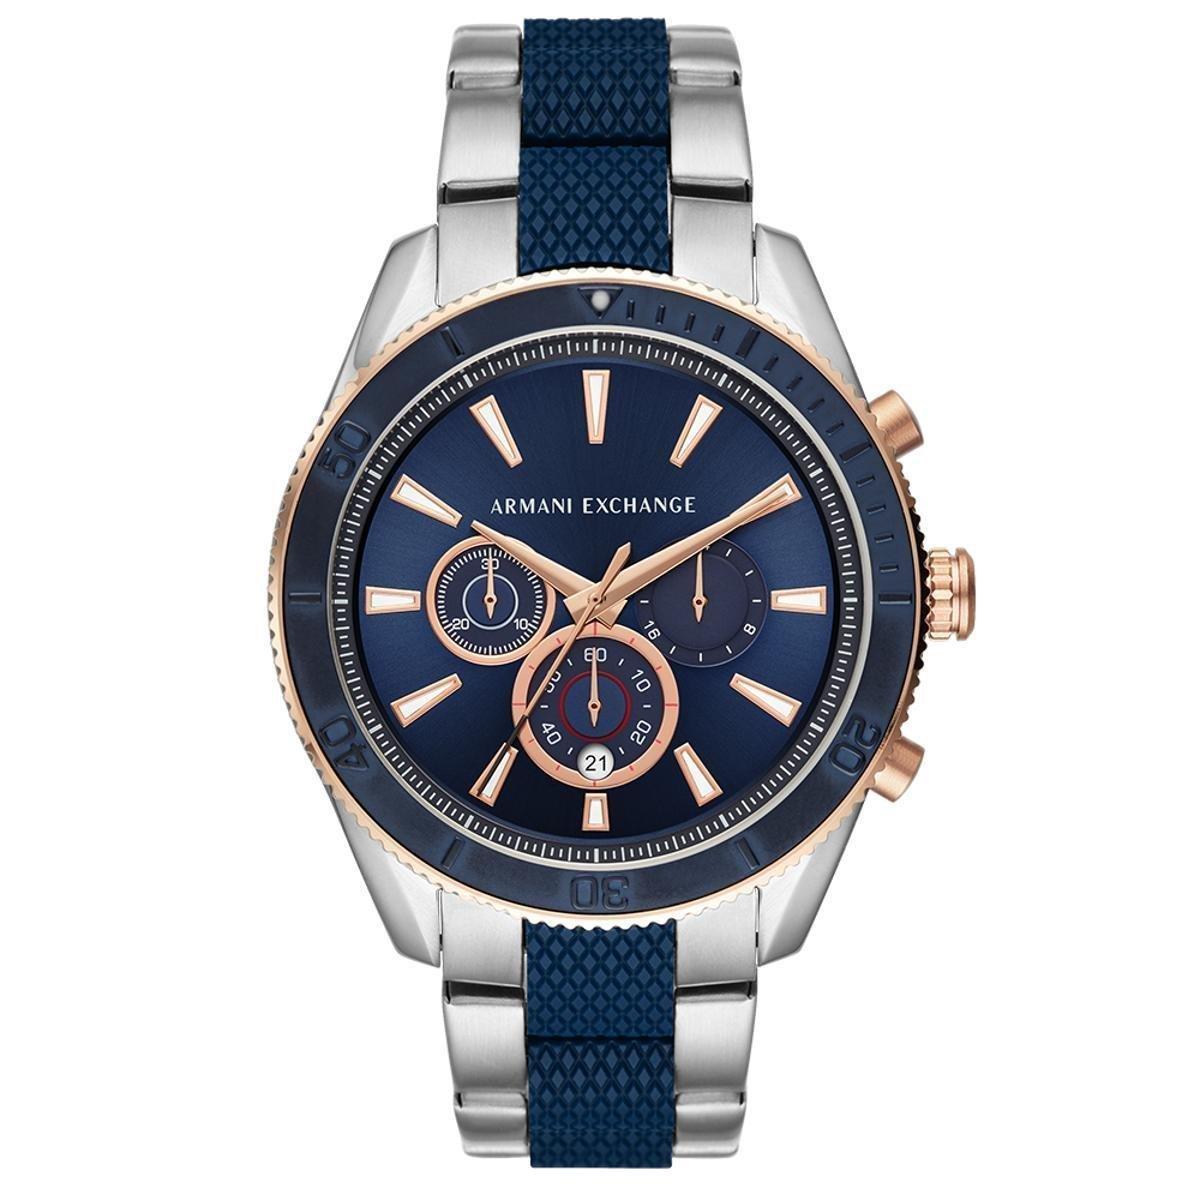 d9dce03b31f4f Relógio Armani Exchange Masculino Enzo AX1819 1KN AX1819 1KN - Prata - Compre  Agora